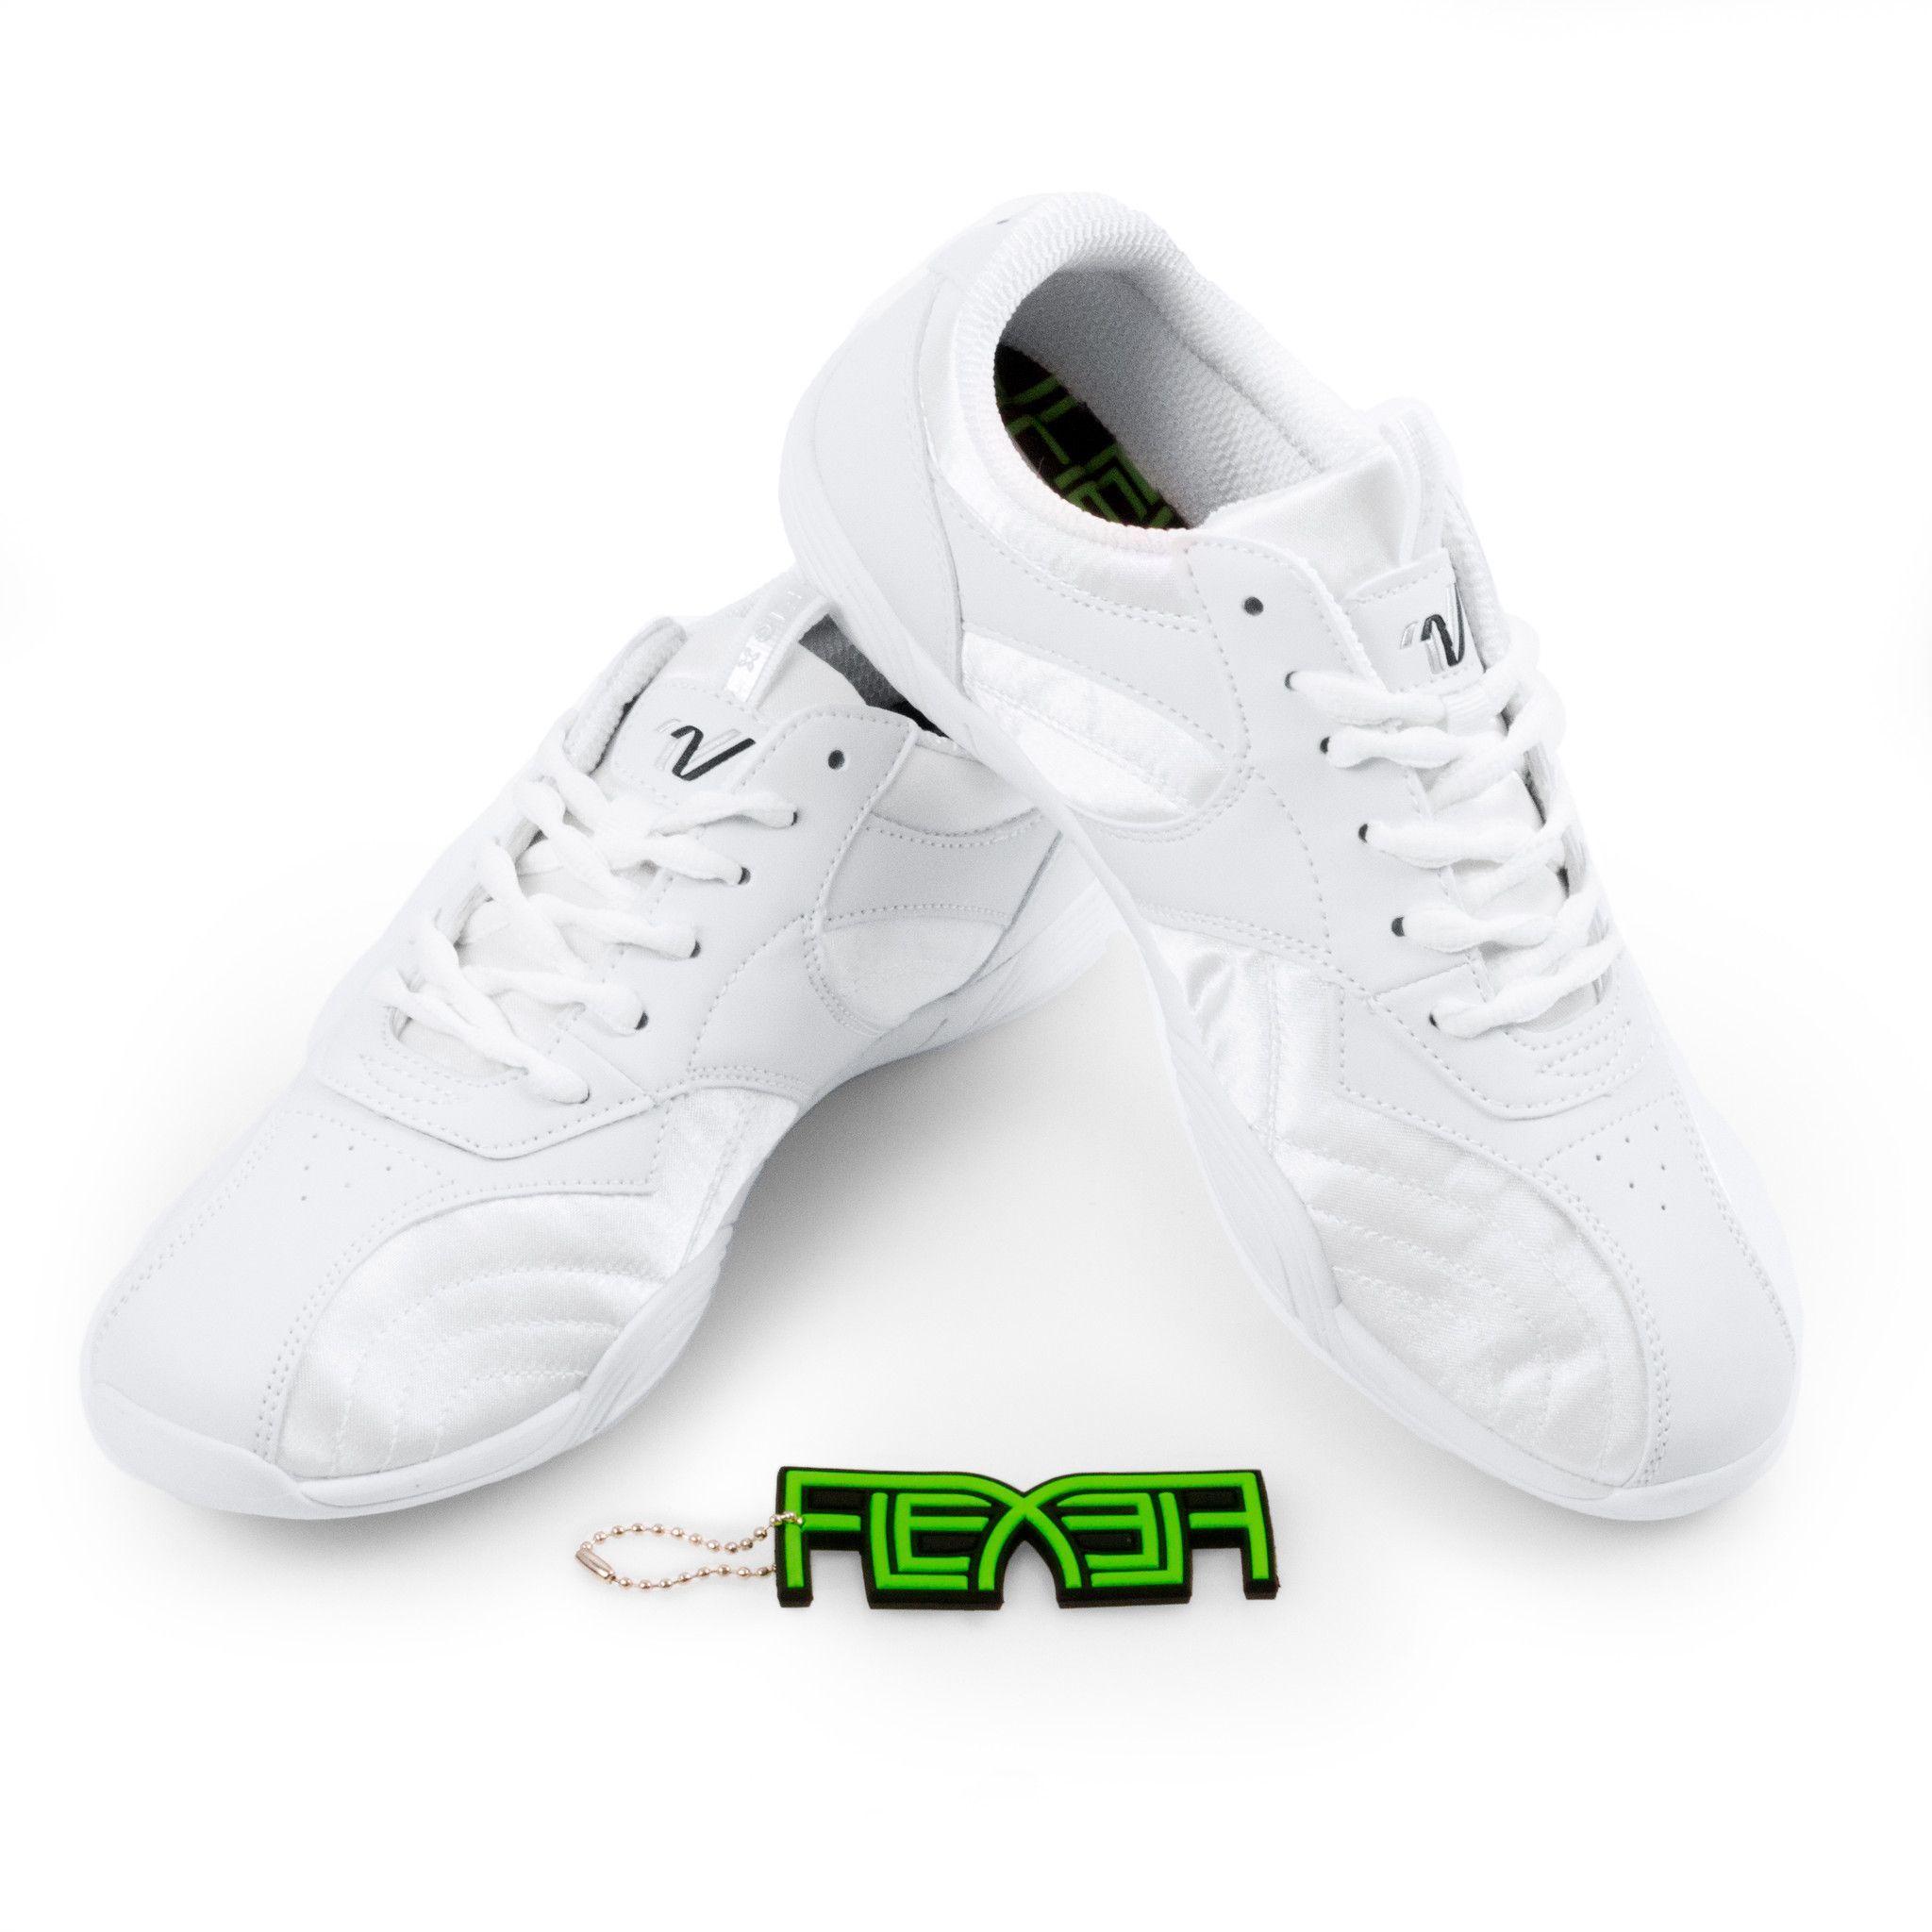 Nfinity Evolution Cheer Shoe, Cheerleading Shoes